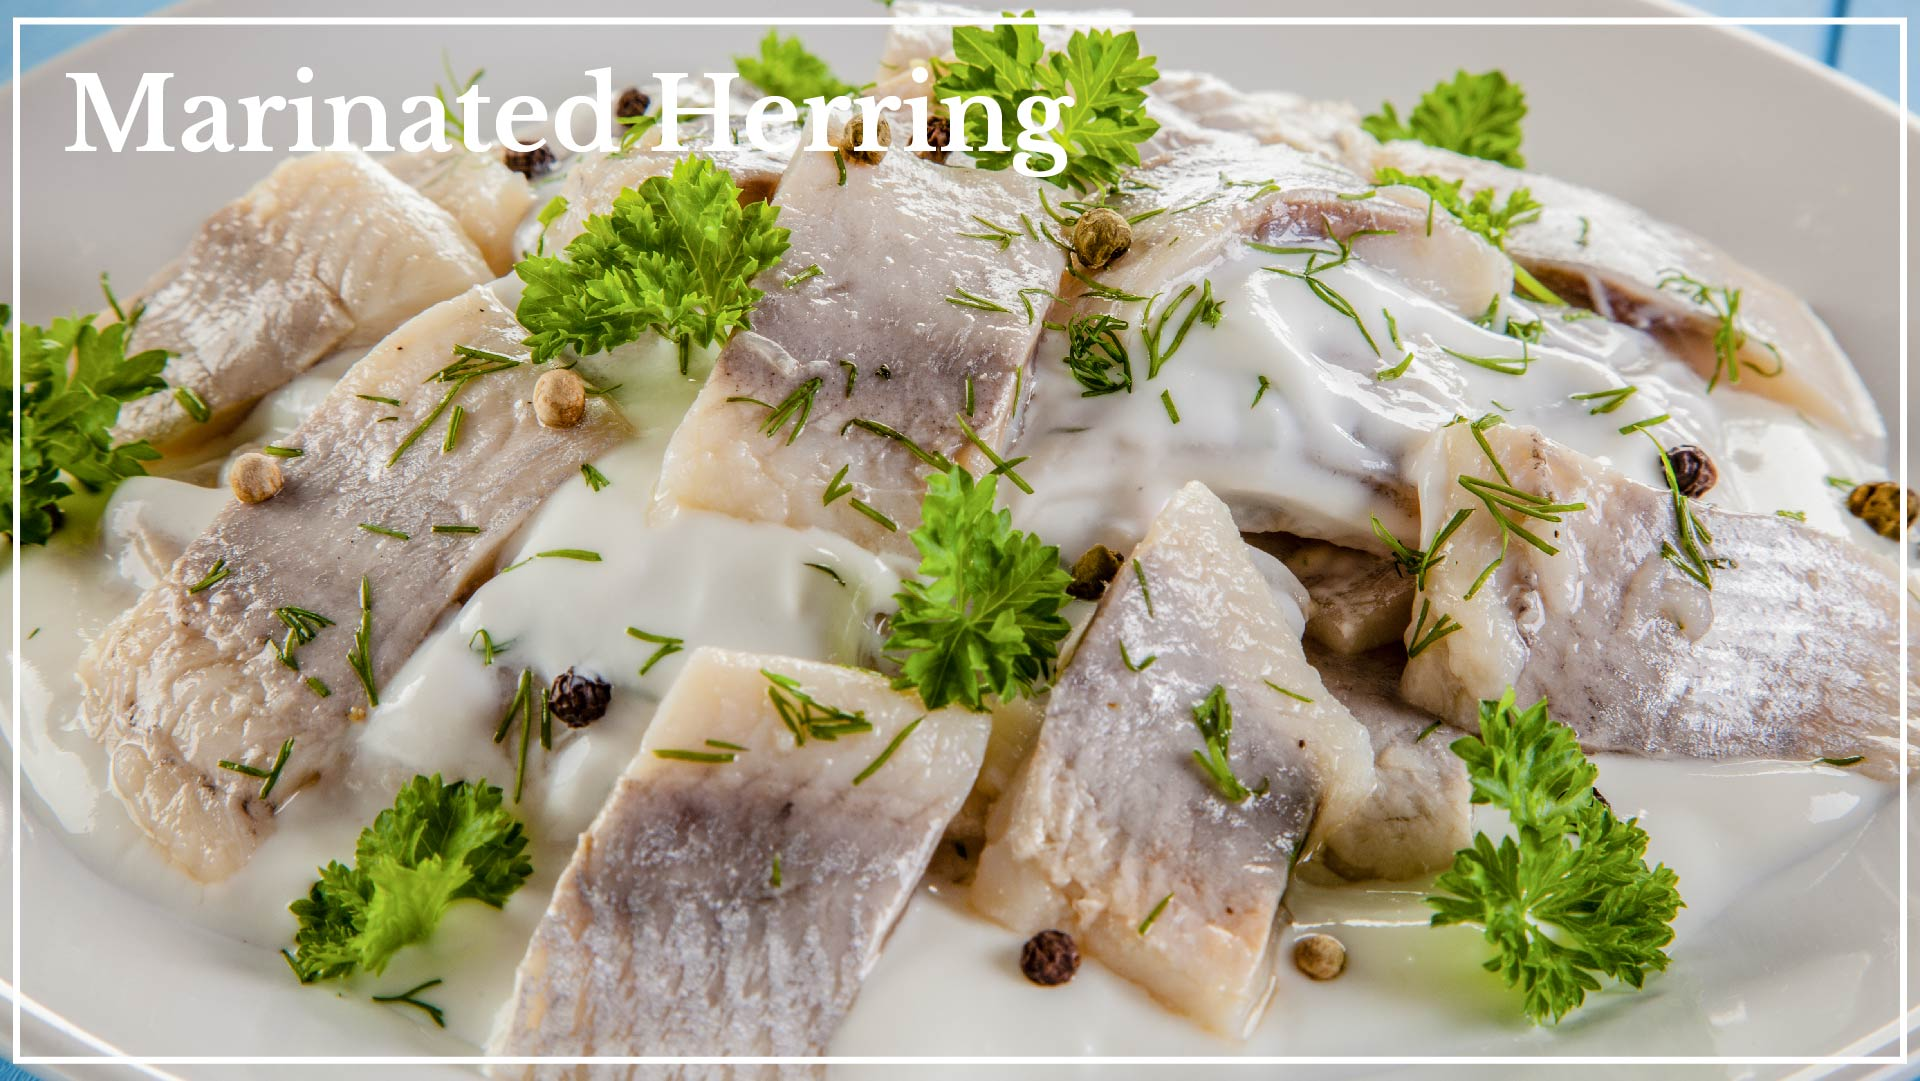 Marinated Herring - herring fillets with cream sauce